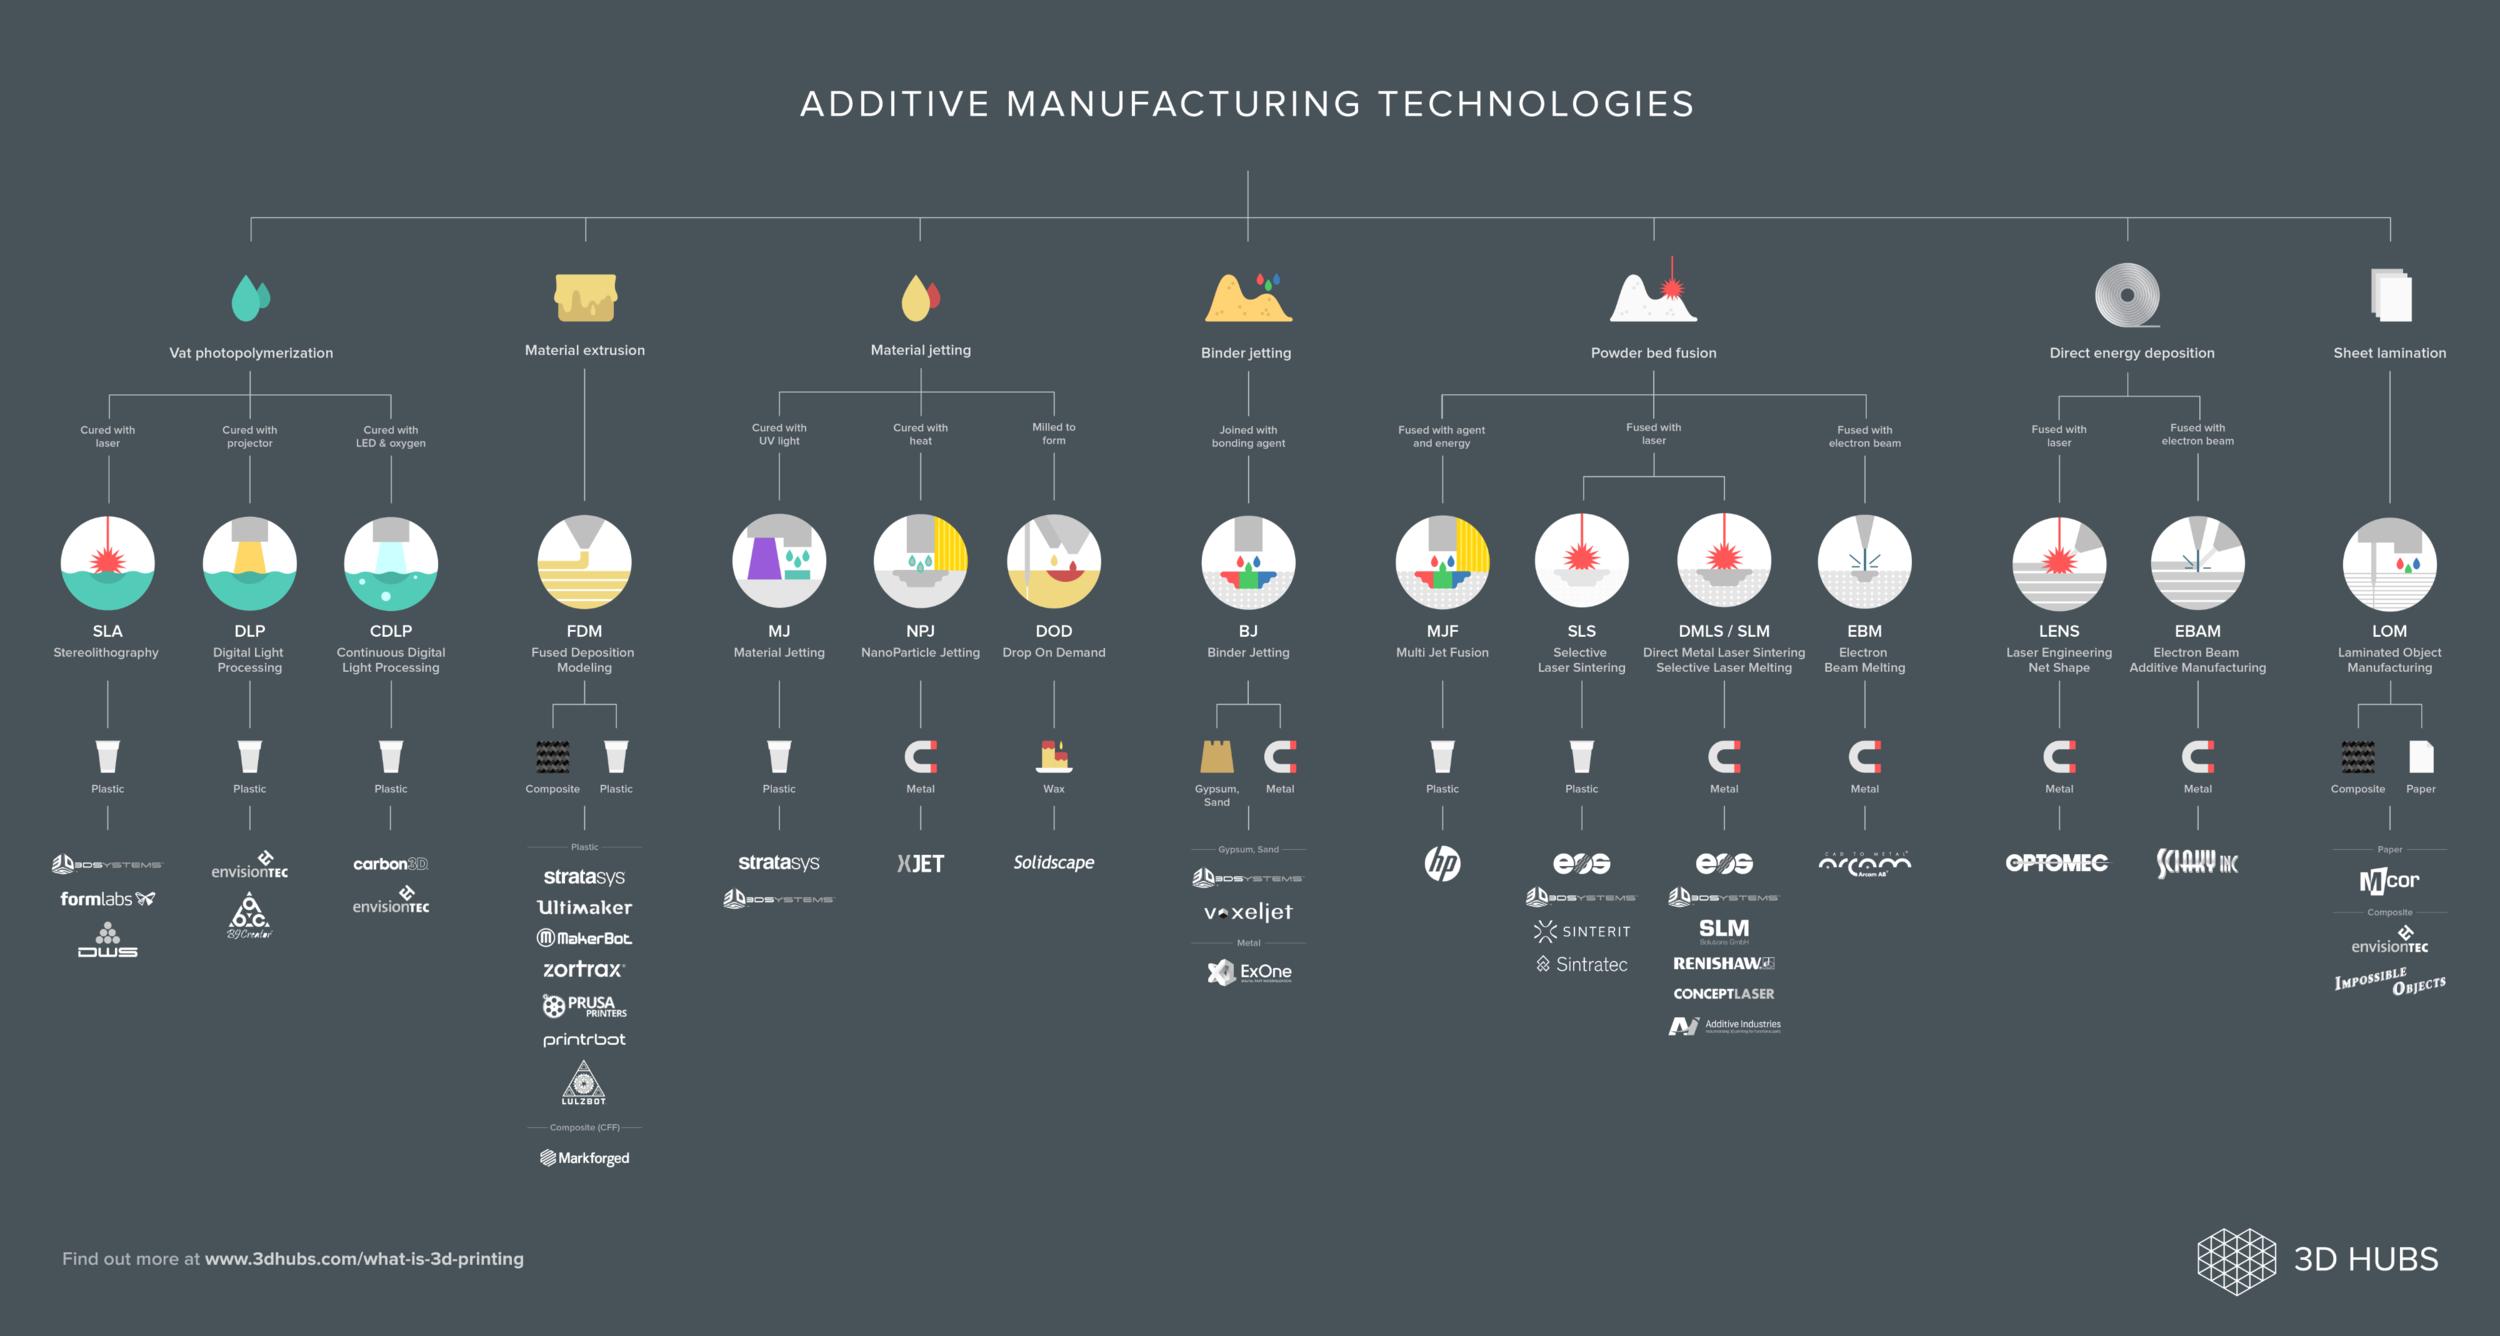 3D Hubs' 3D Printing Process Chart is Comprehensive, But…